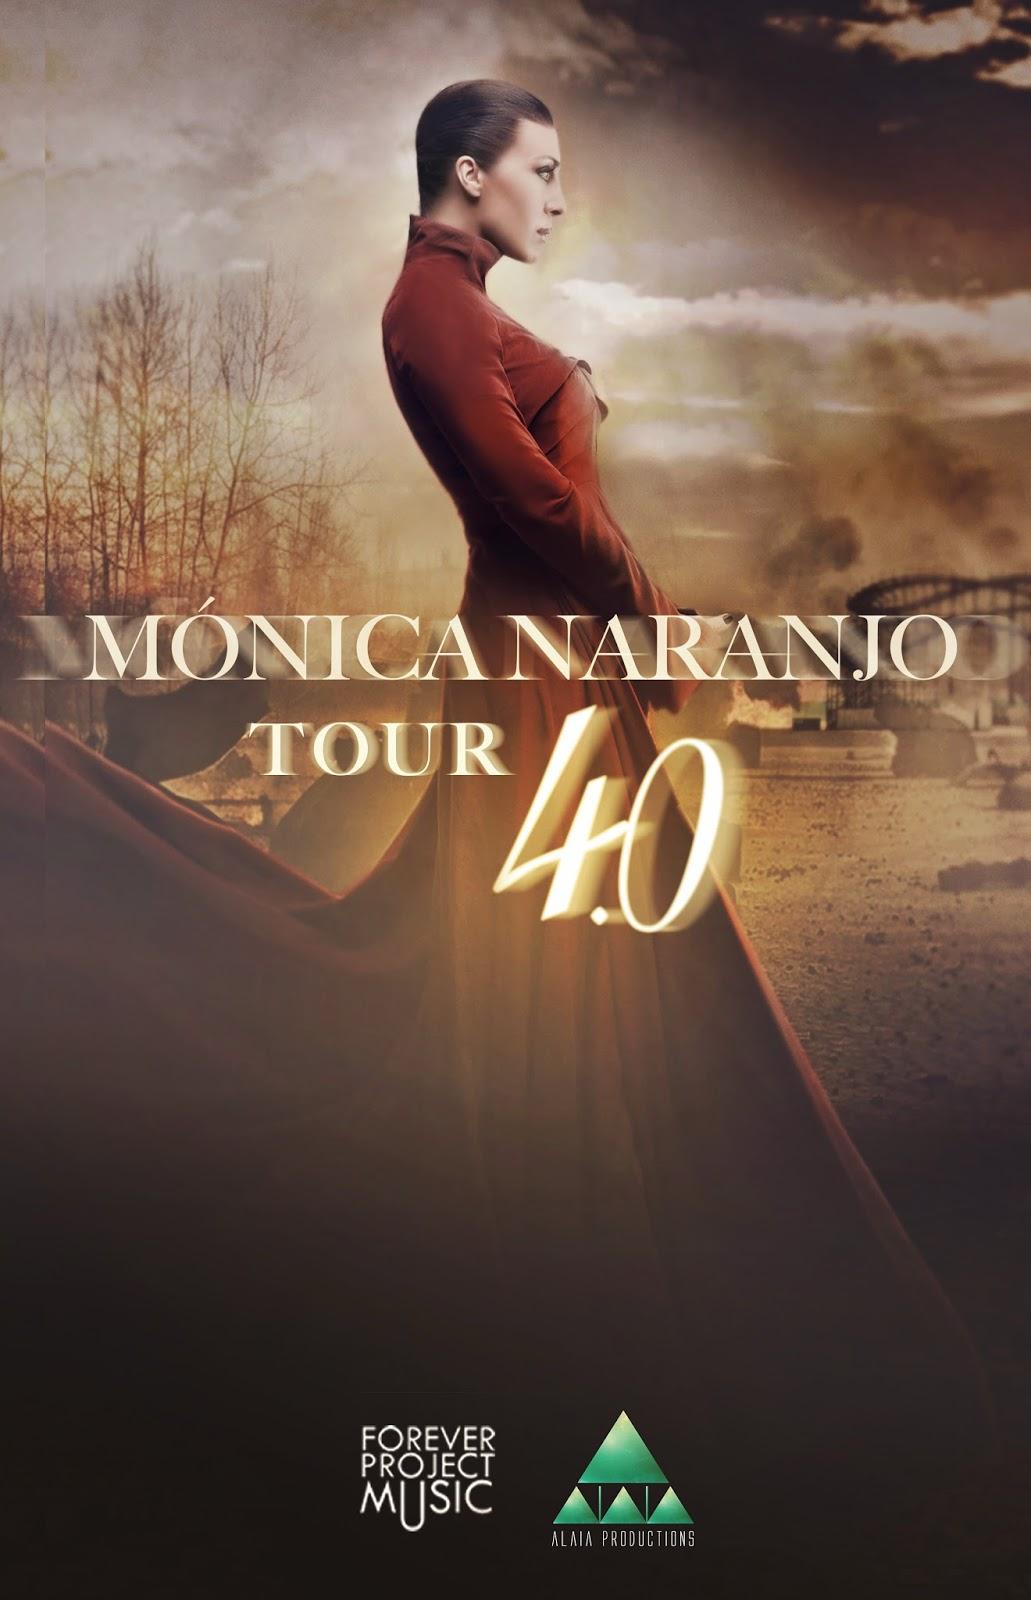 monica naranjo 4.0 tour